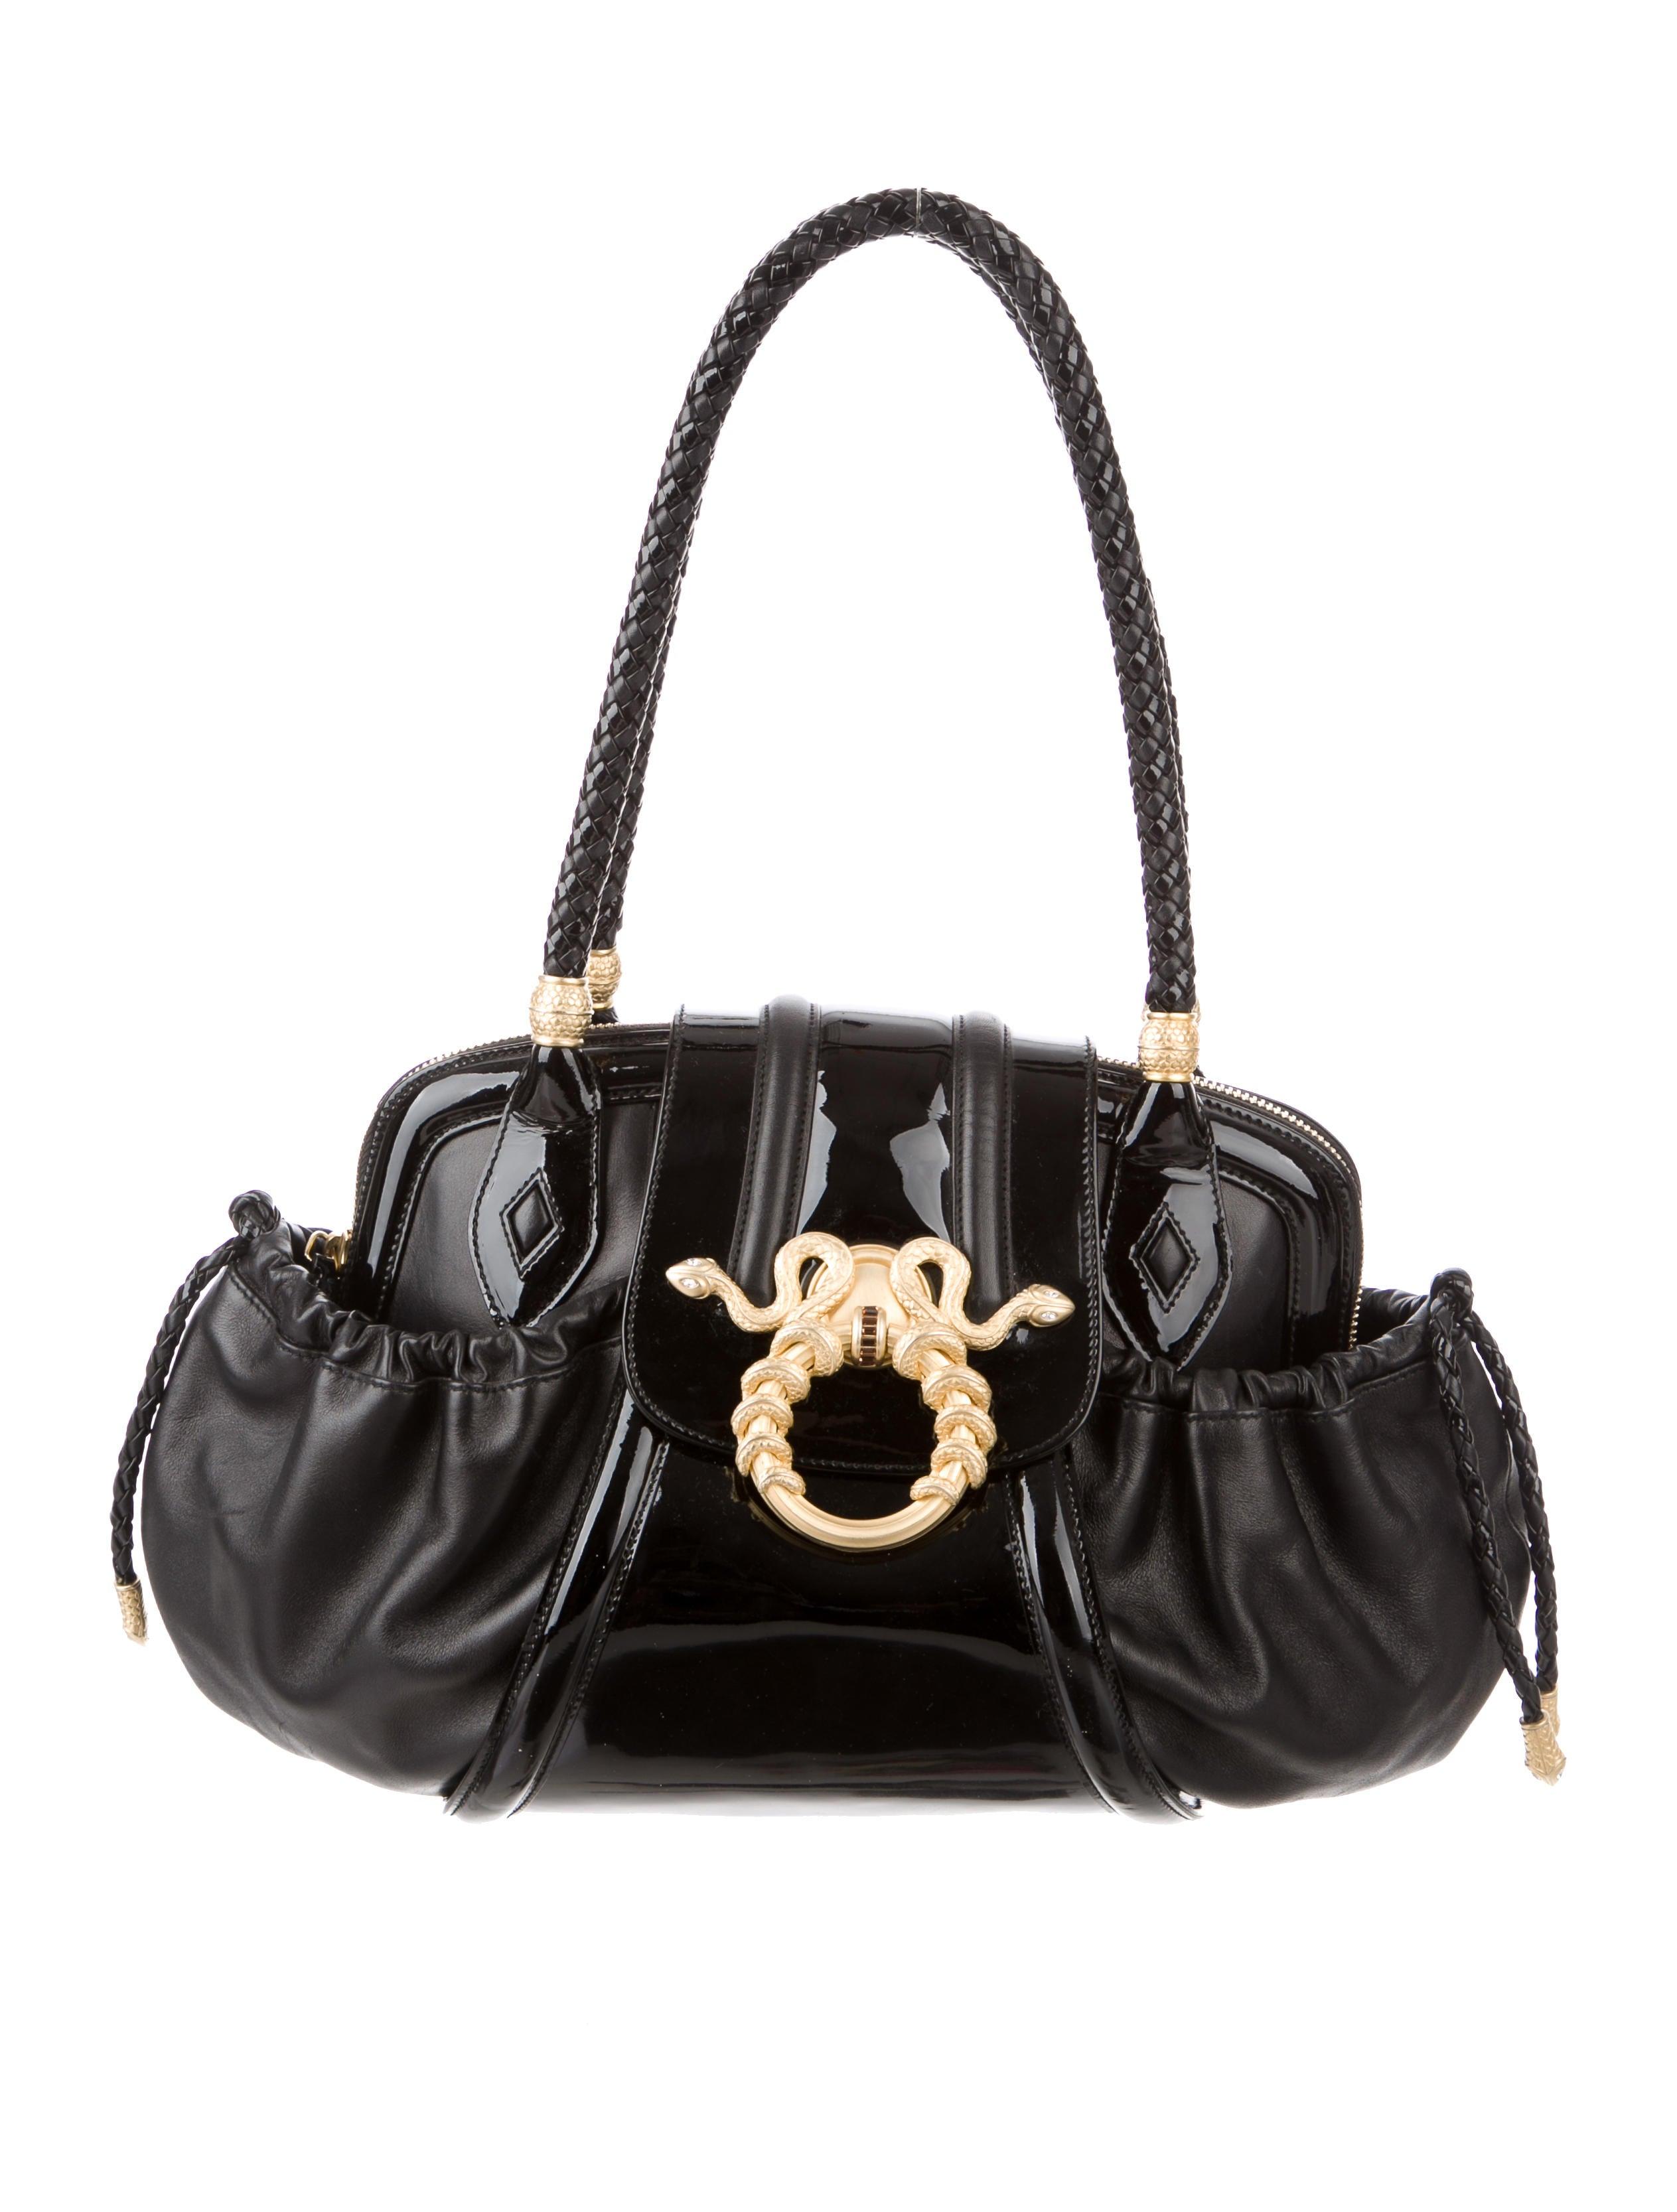 Judith Leiber Medusa Shoulder Bag - Handbags